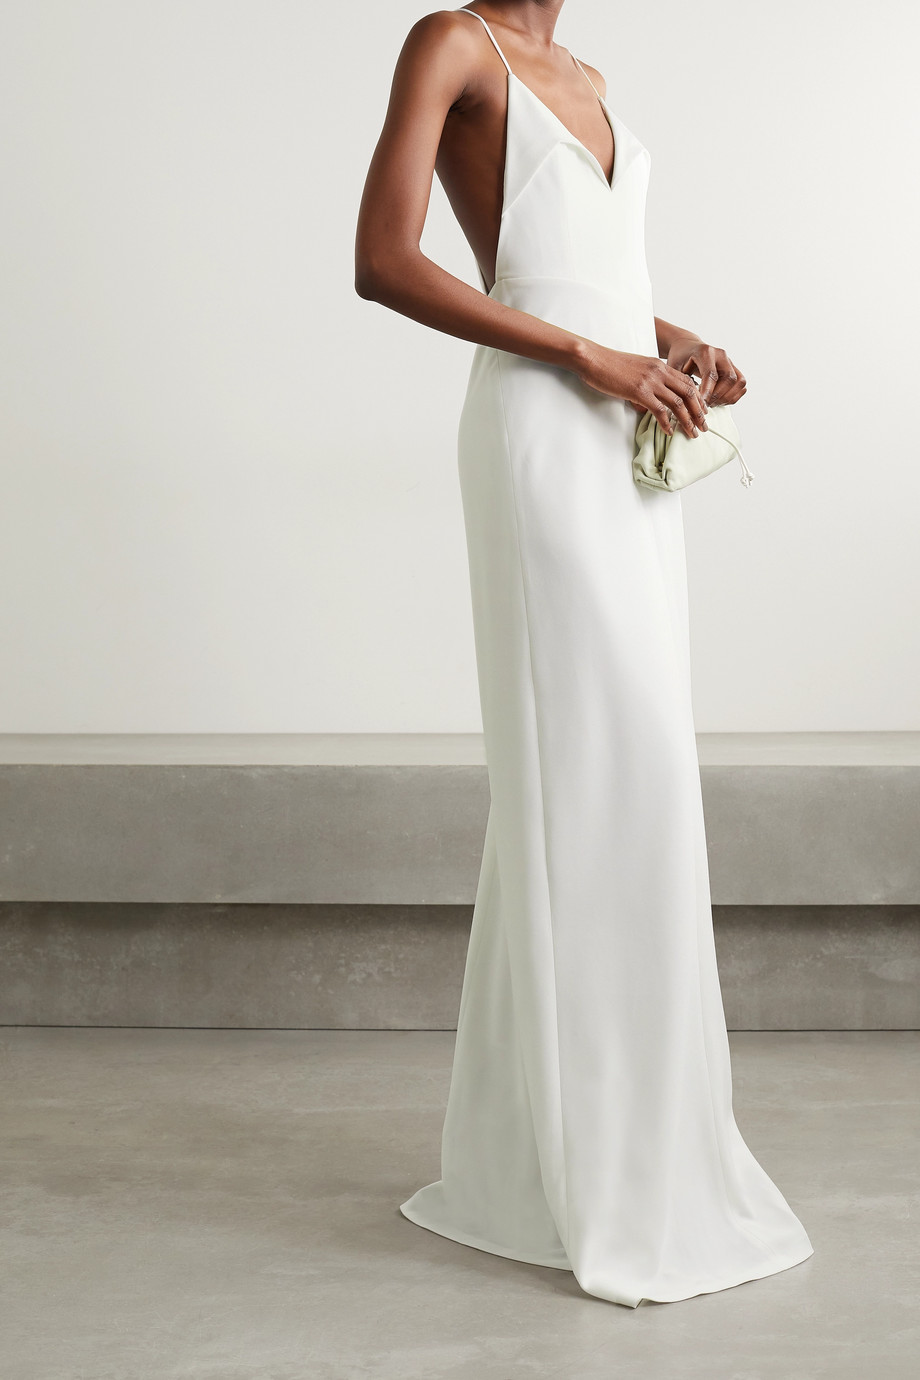 Galvan Punta crepe gown